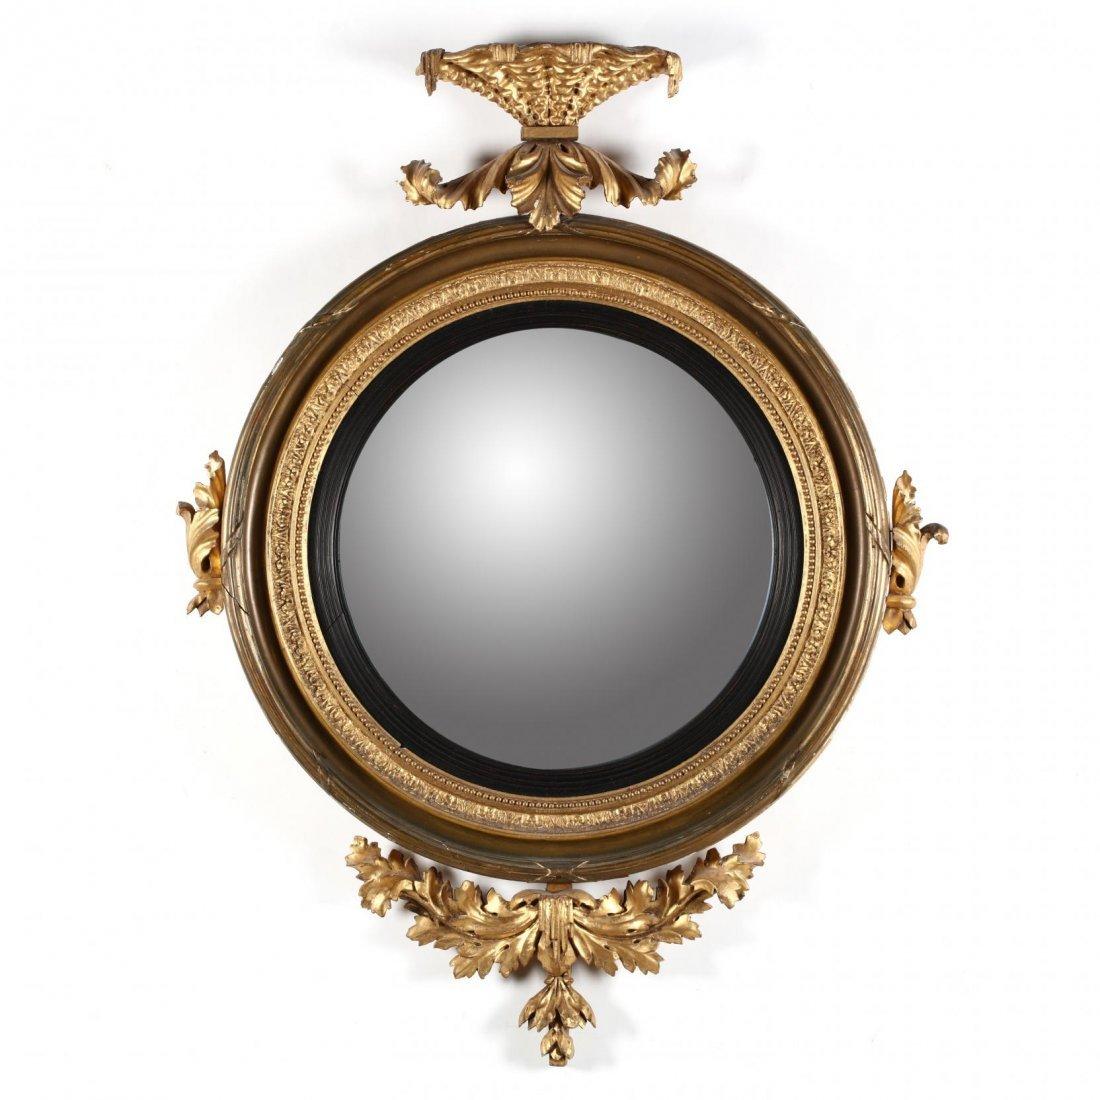 A Regency Carved and Gilded Bullseye Mirror